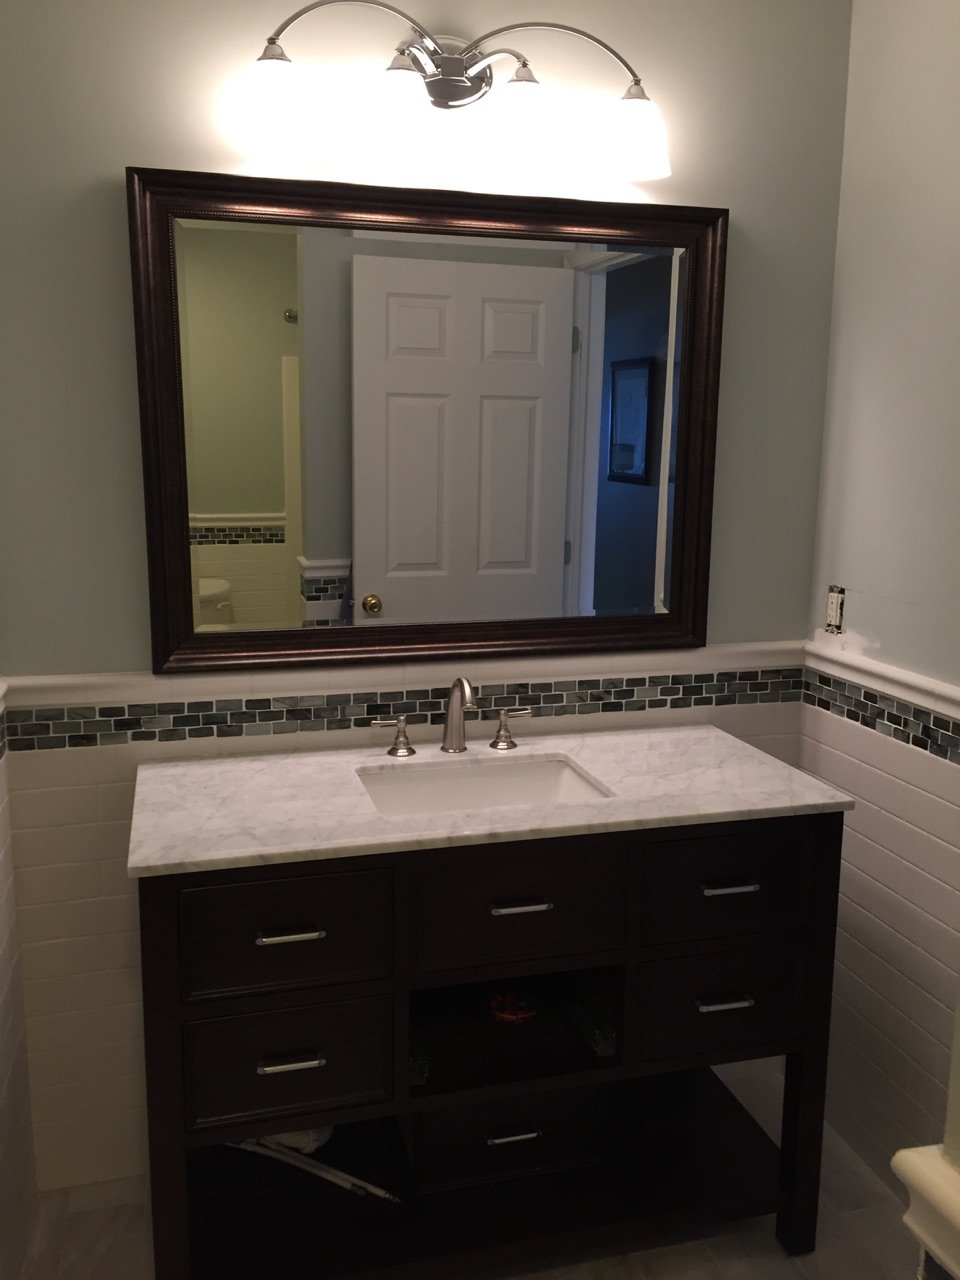 J R Floor Covering Saratoga Springs Ny Tile Bathroom Ballston Spa Ny